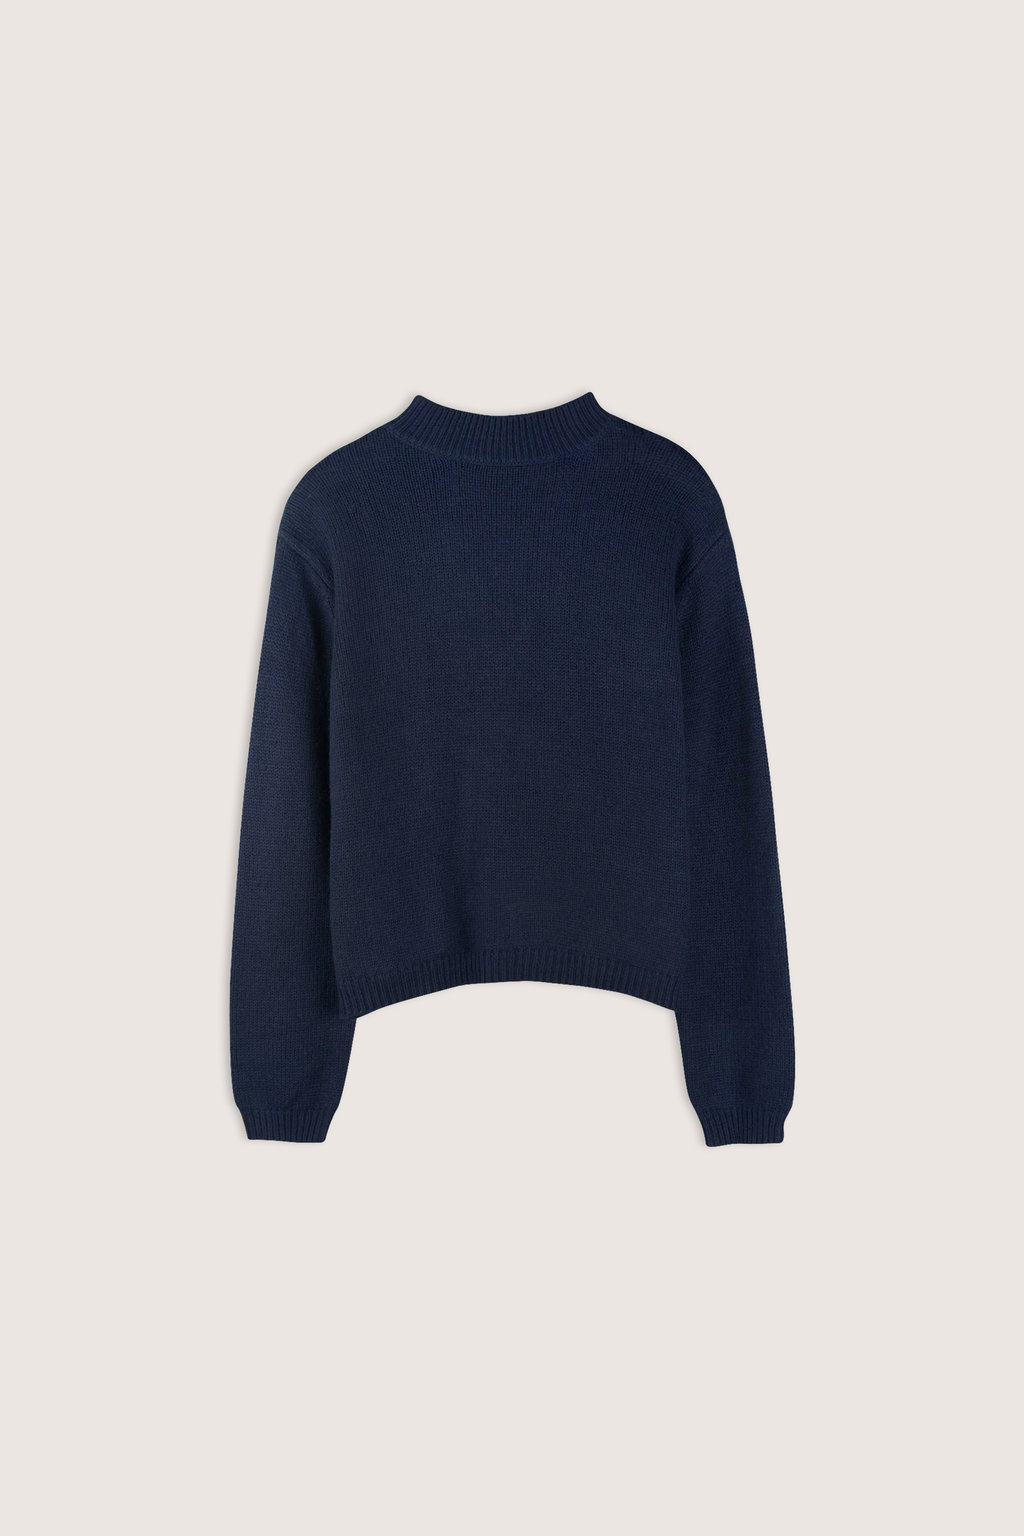 Sweater 1783 Blue 9